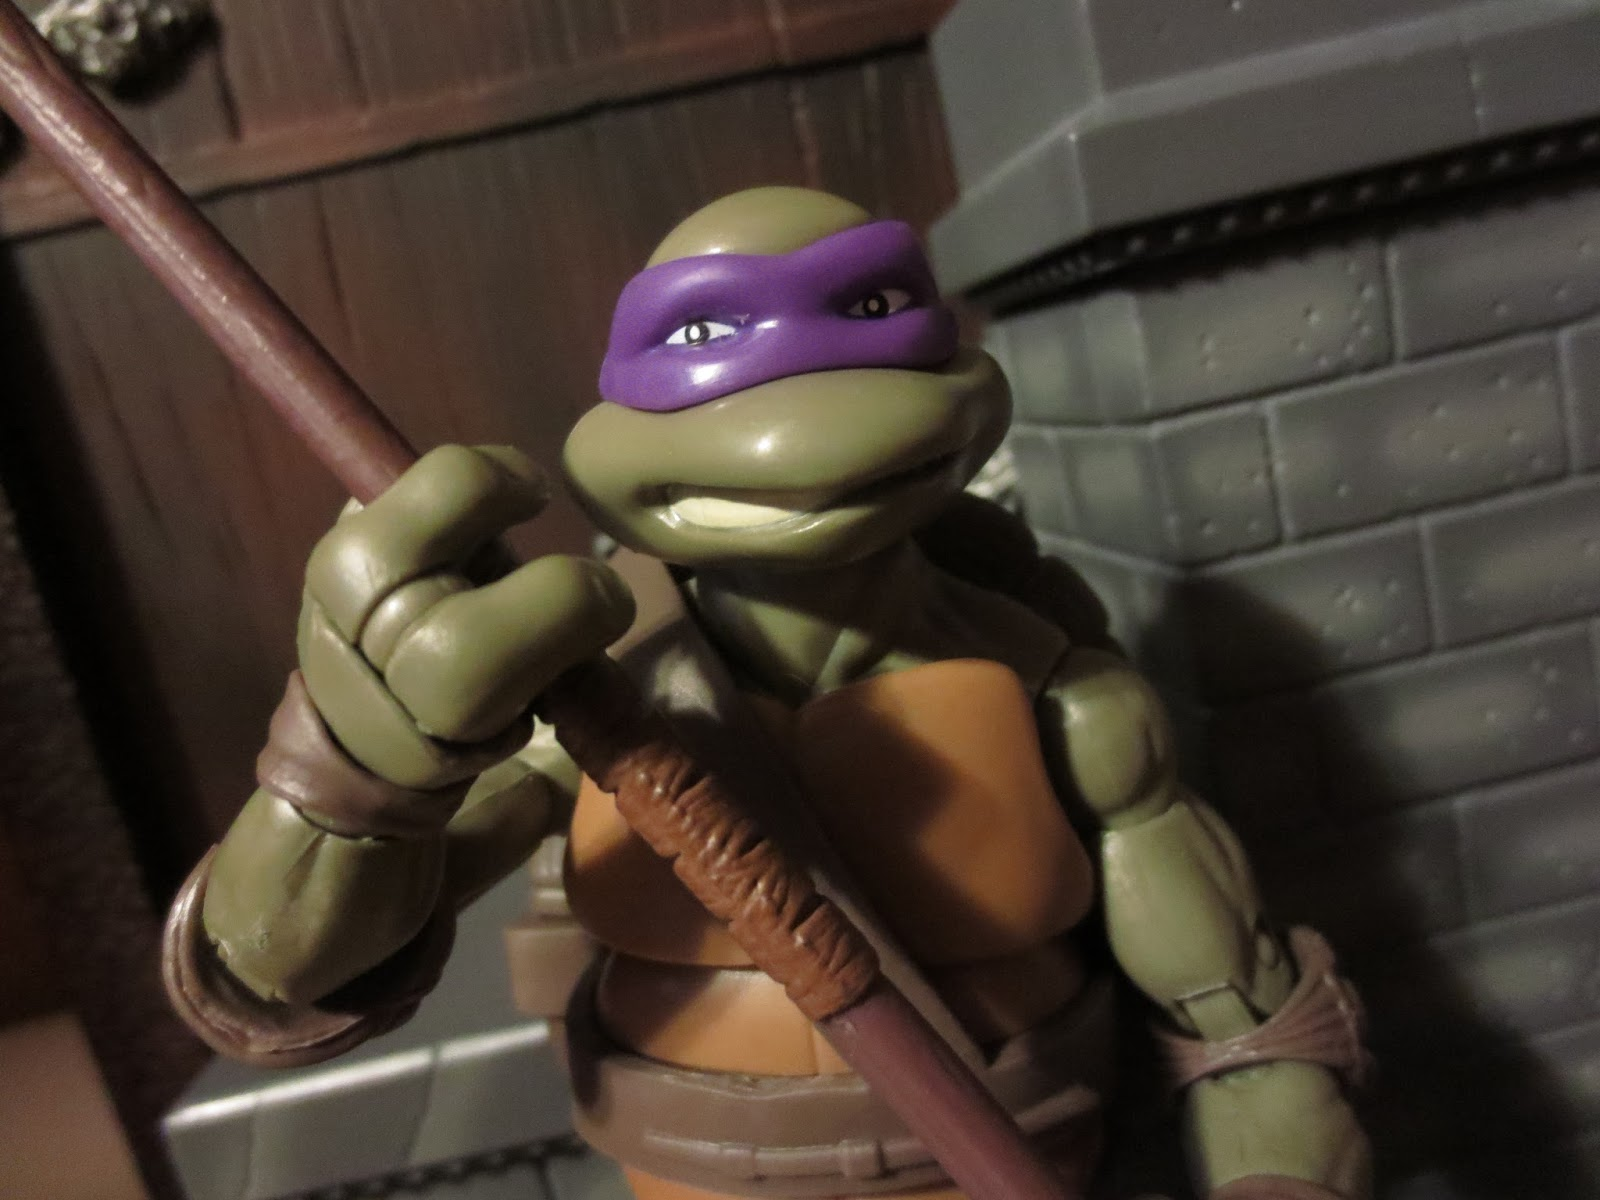 Retro review teenage mutant ninja turtles ii secret of the ooze - Action Figure Review Donatello From Teenage Mutant Ninja Turtles Classic Collection The Secret Of The Ooze By Playmates Toys